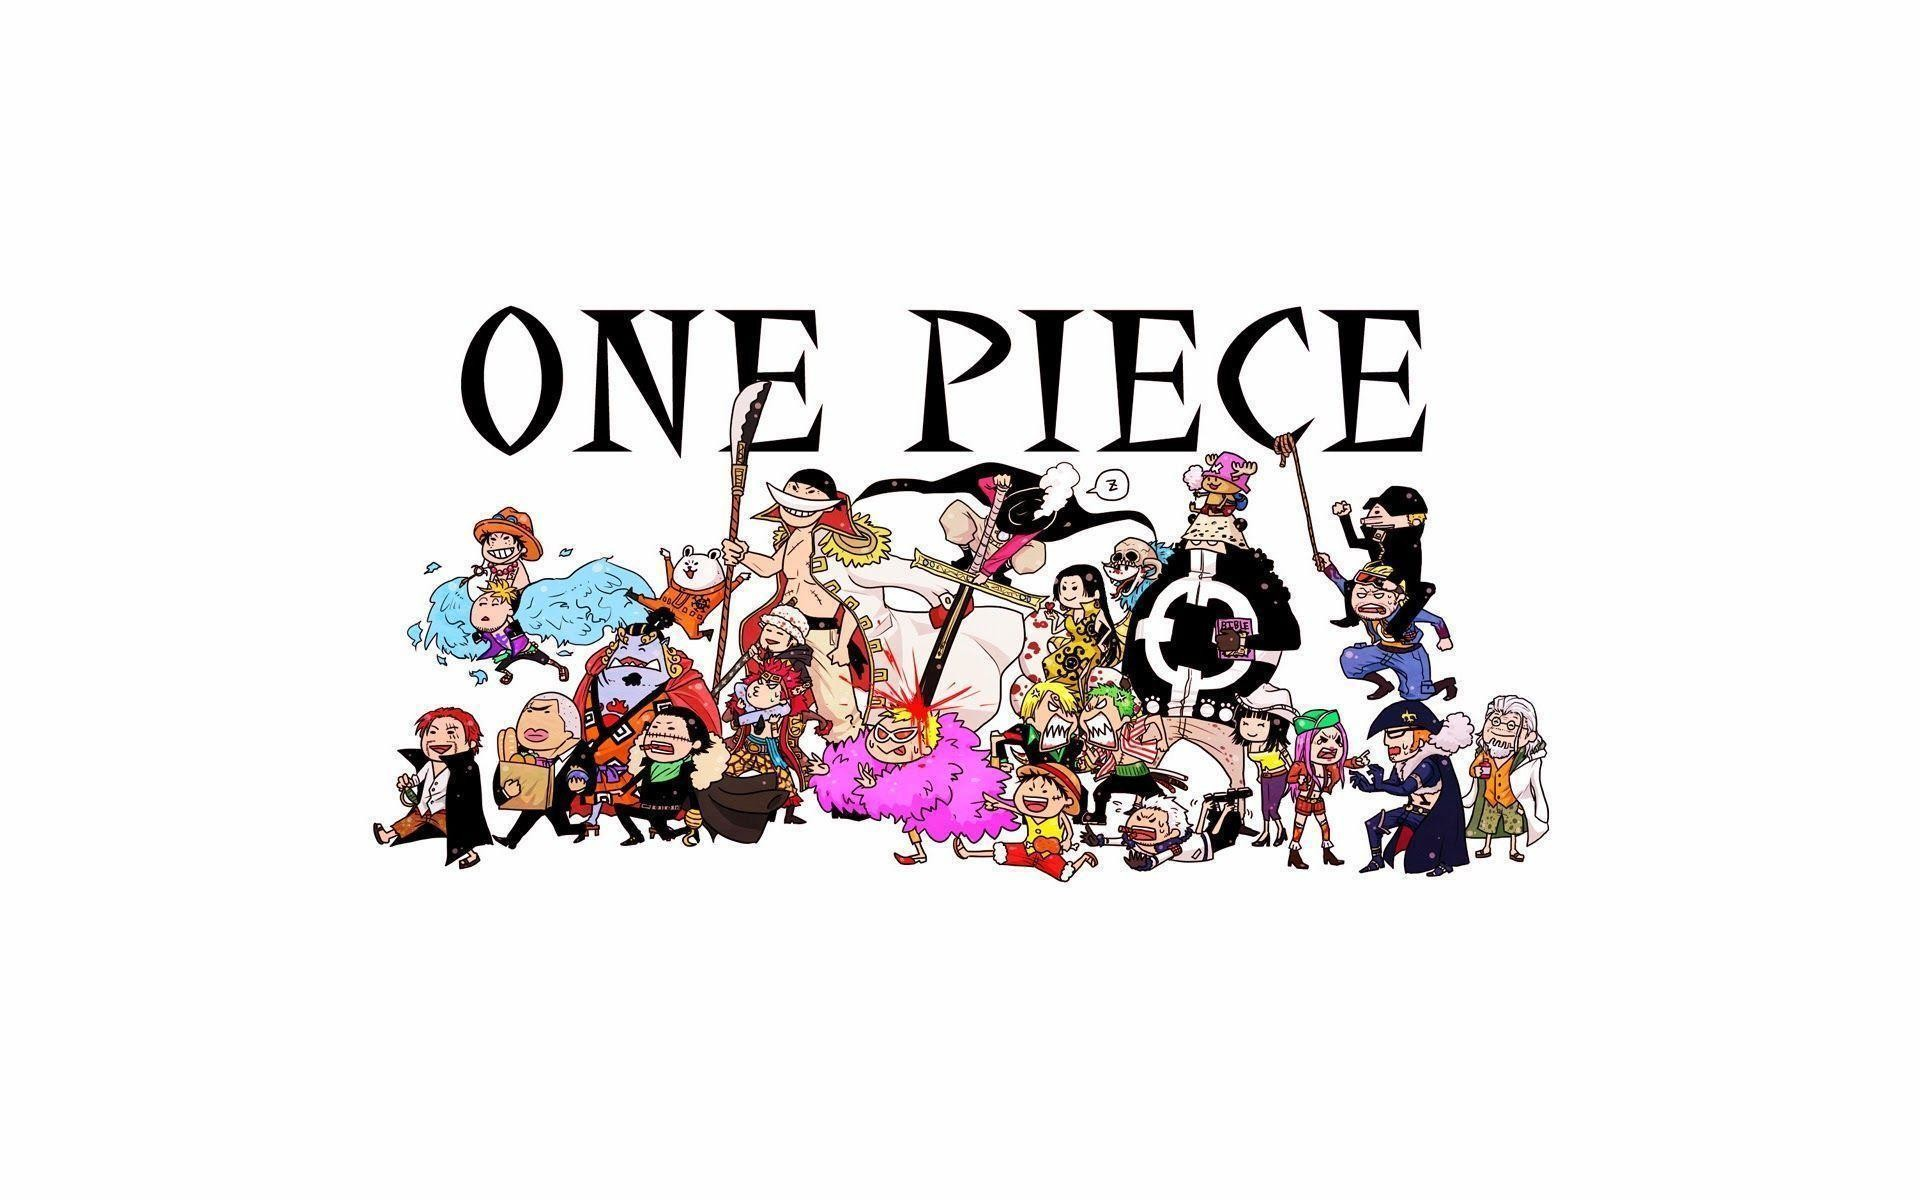 One Piece Anime Chibi 27 HD Wallpaper